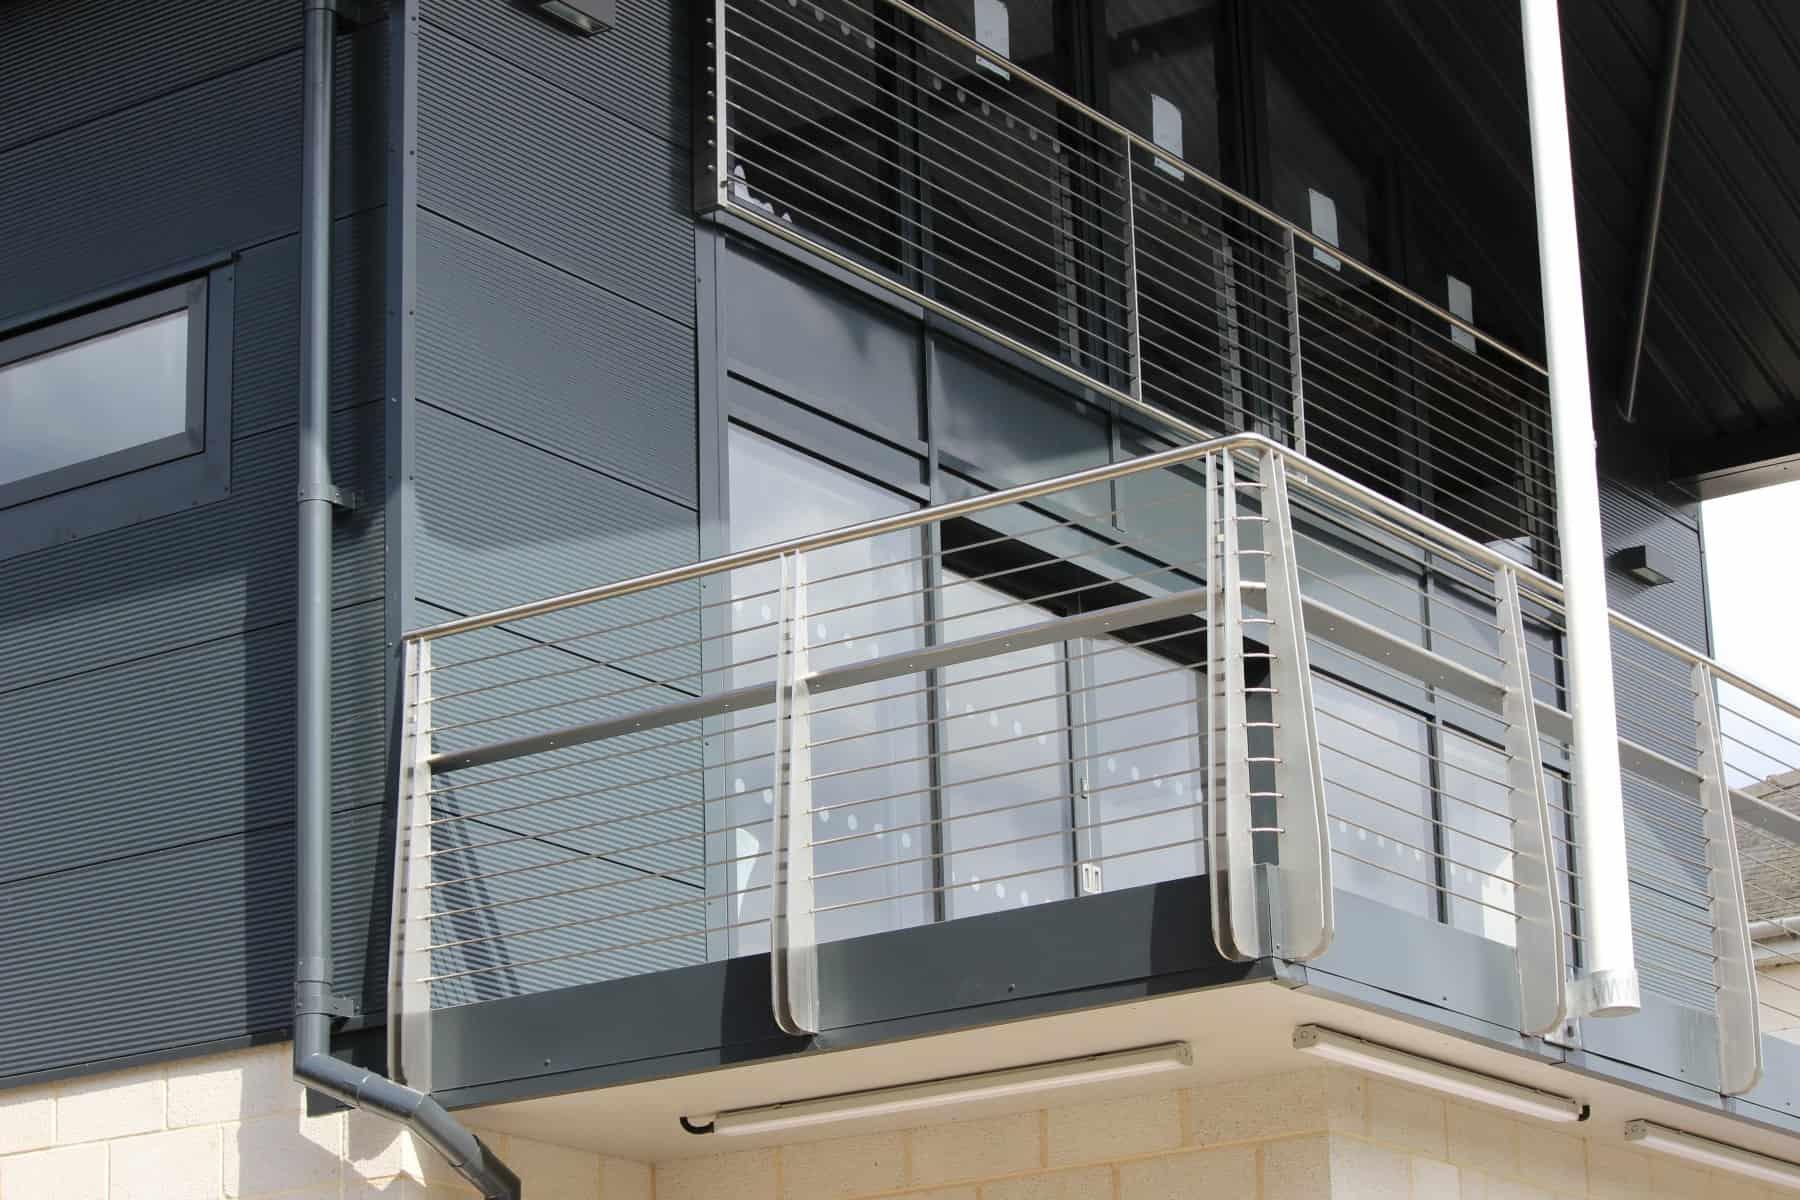 Juliet Balcony City Of Cambridge Rowing Club Balcony Corner Outside Wrightfield Ltd 2